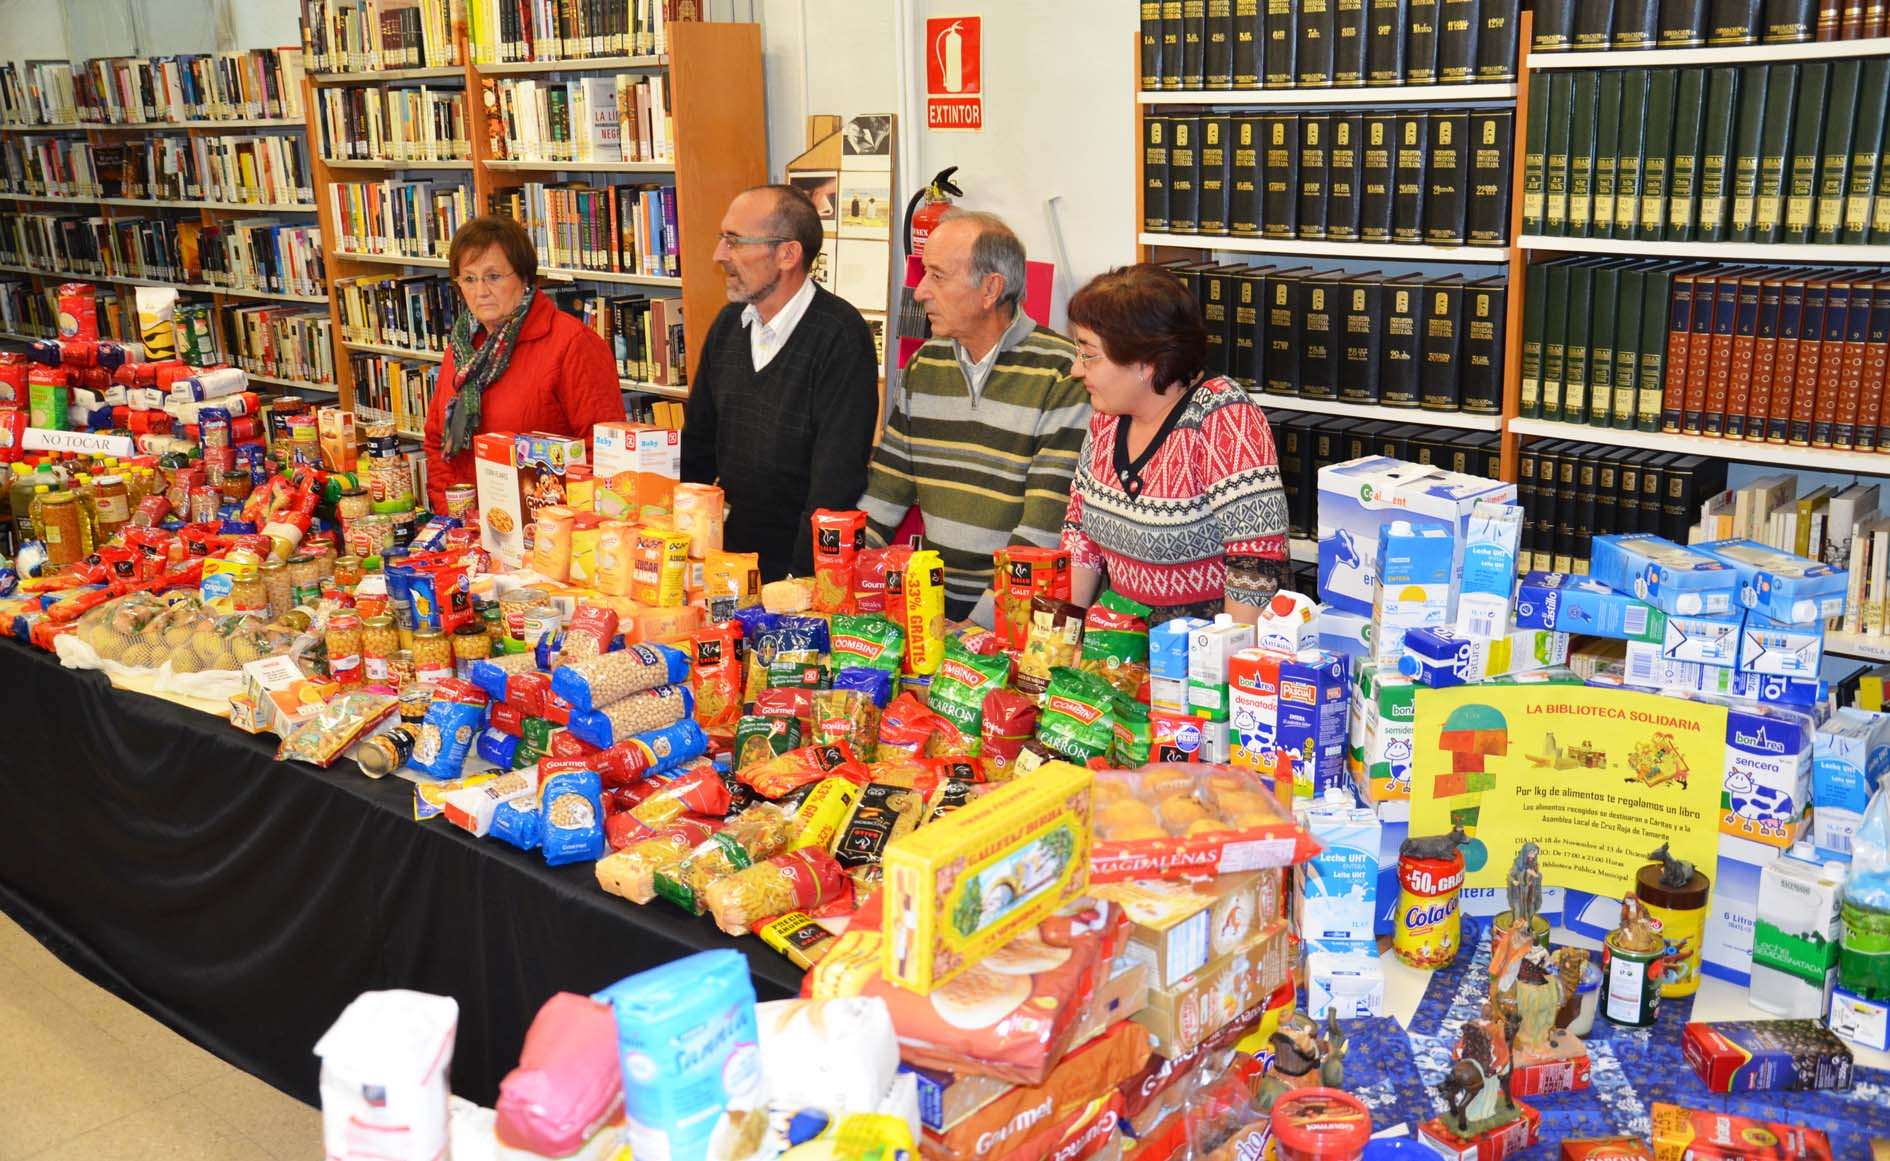 La Biblioteca de Tamarite se llena de solidaridad